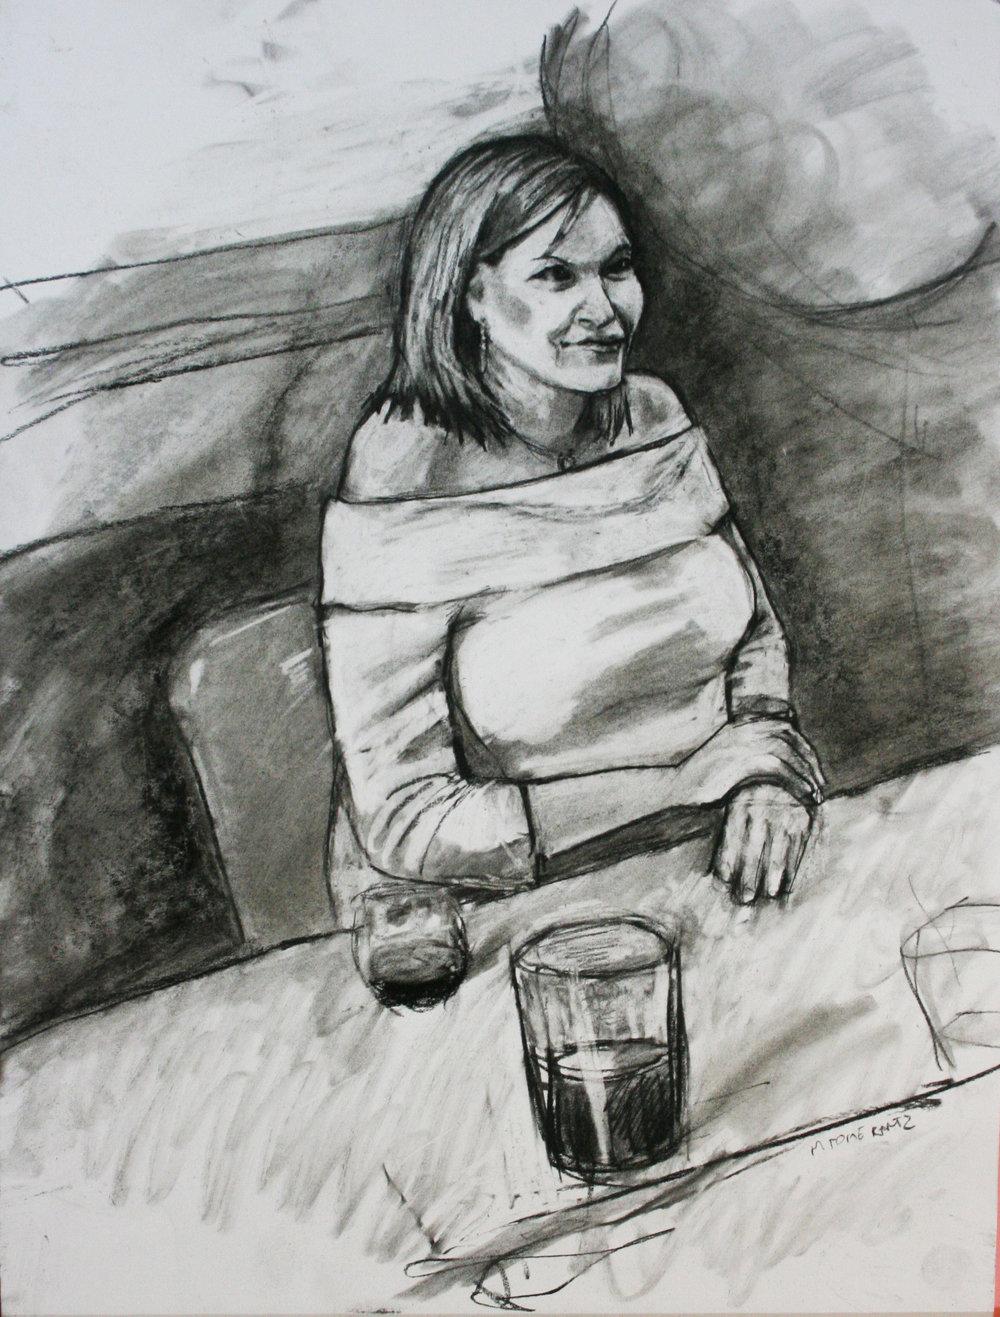 Michael Polmerantz did this 3-hour drawing.